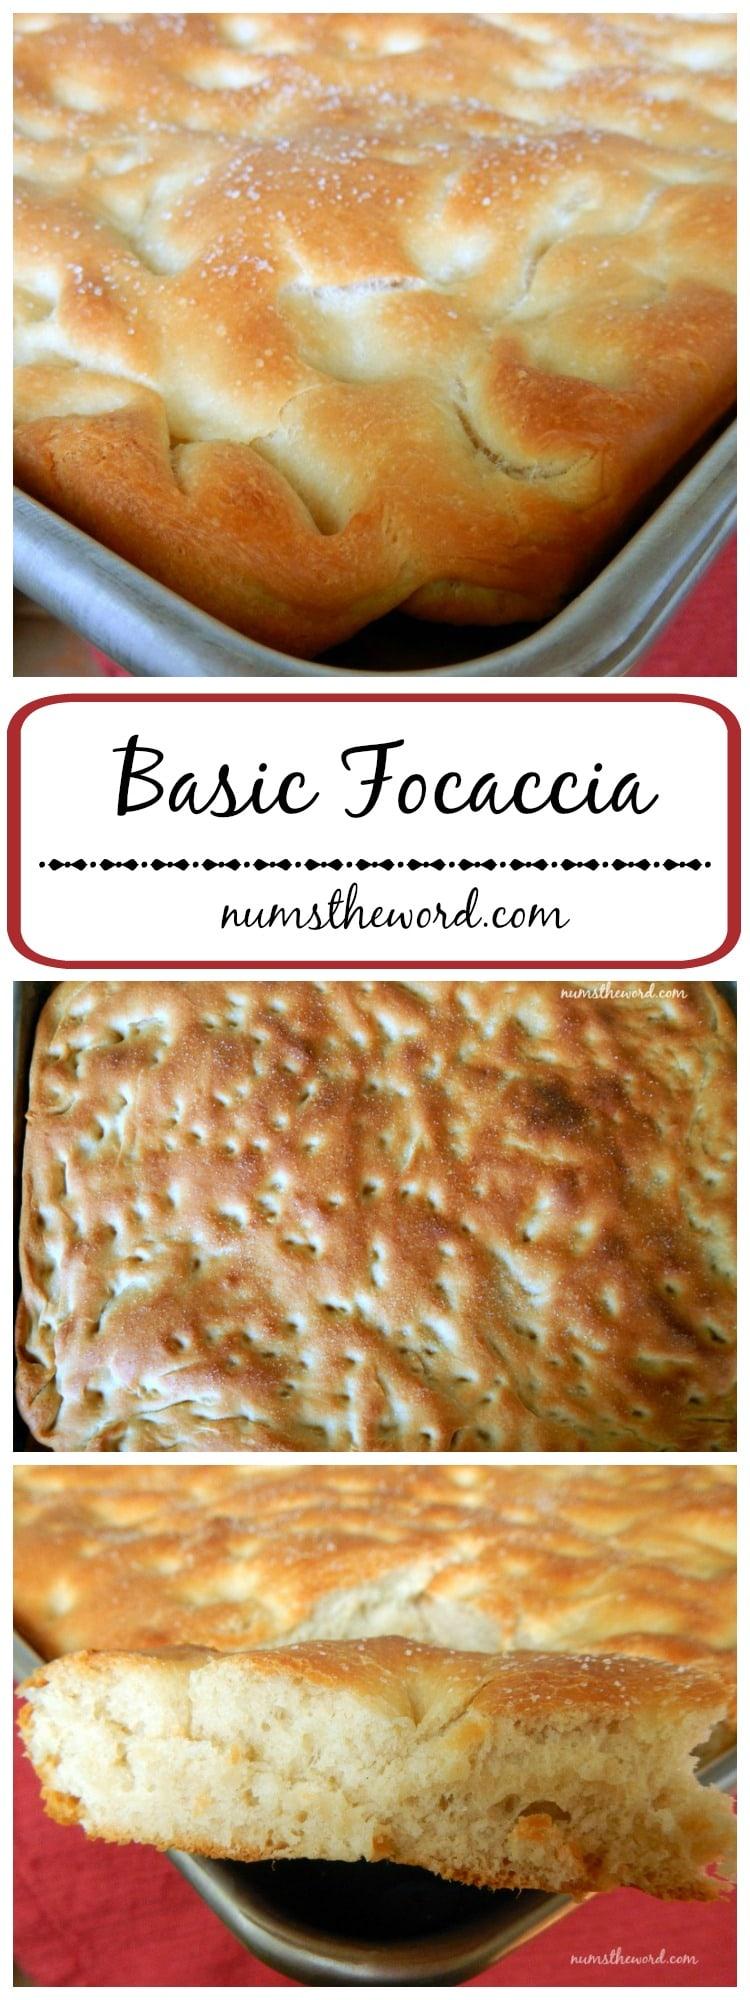 Basic Focaccia Bread LONG